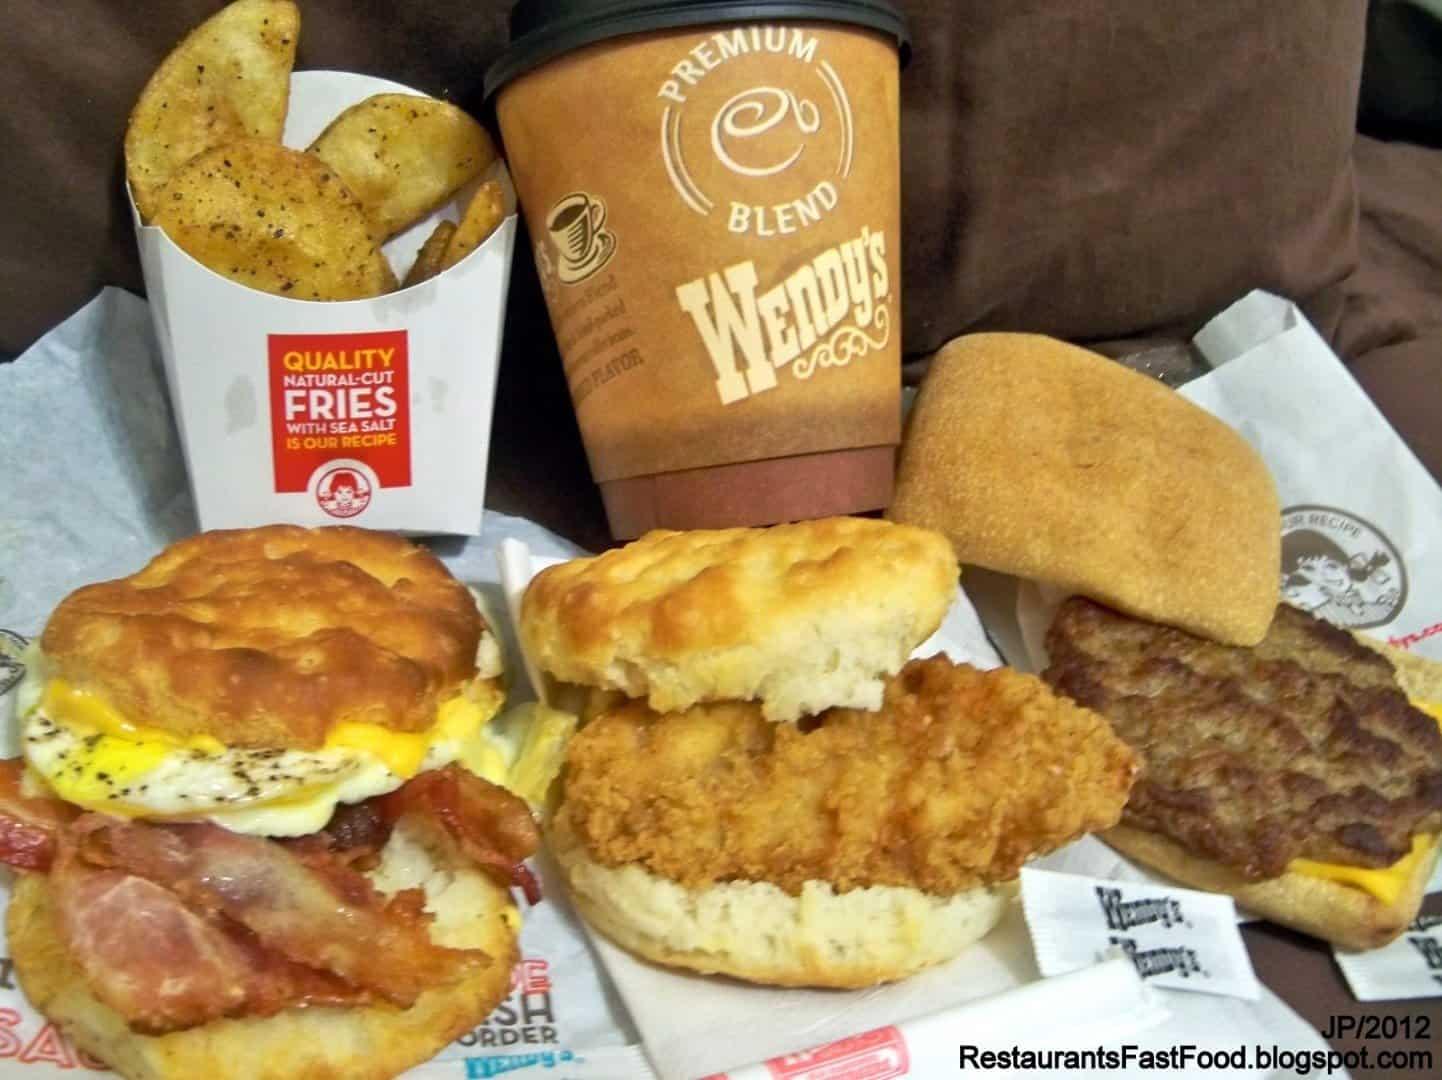 Fast Food Restaurants That Failed